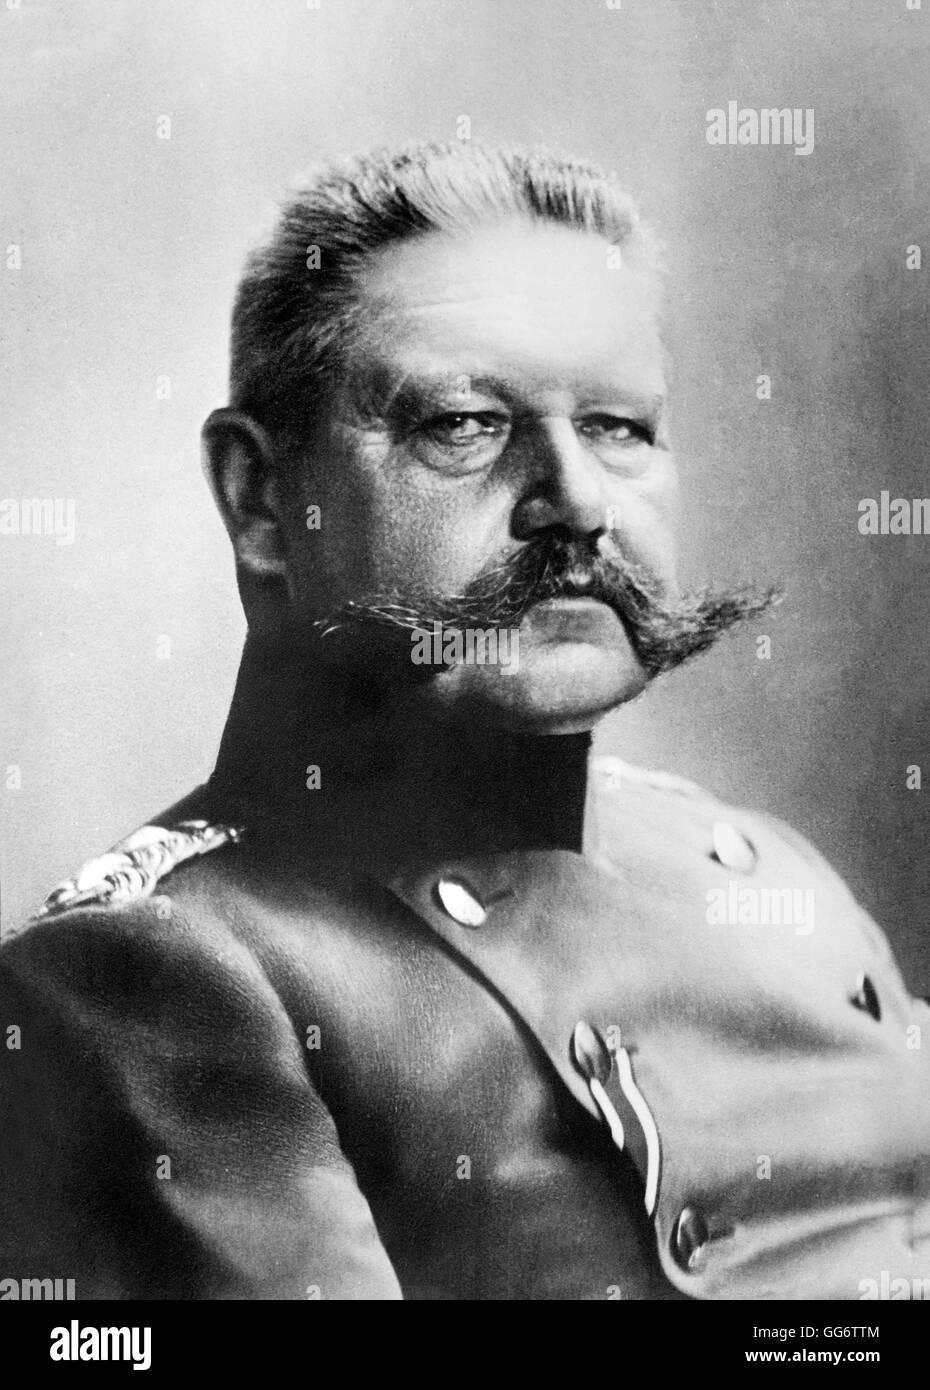 Paul von Hindenburg. Portrait of Generalfeldmarschall Paul von Hindenburg (1847-1934), Chief of the General Staff - Stock Image